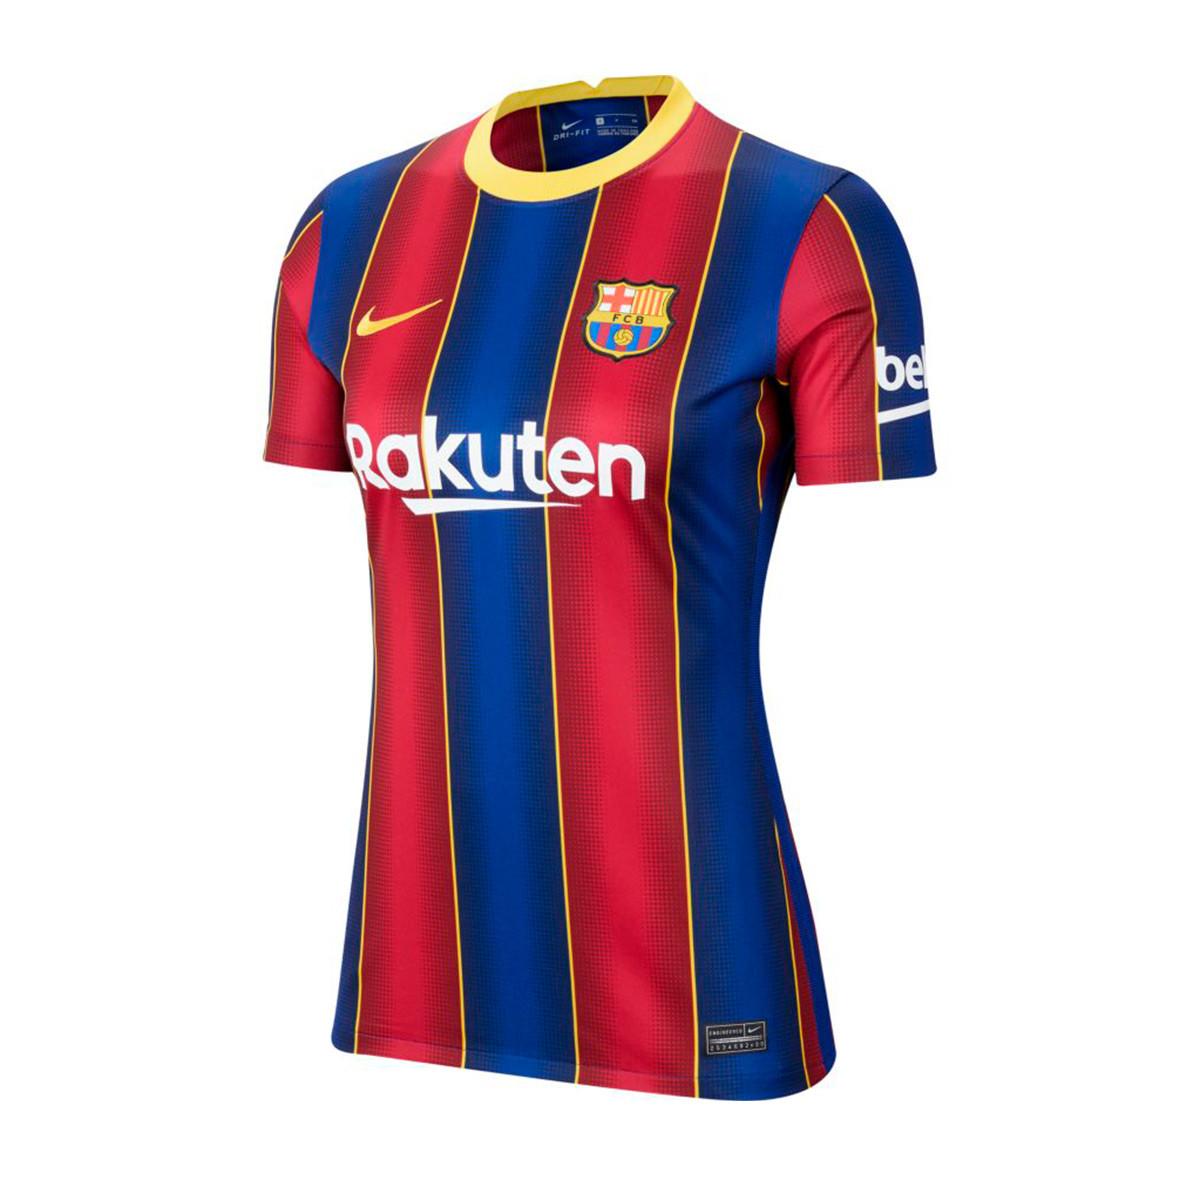 Jersey Nike Fc Barcelona Stadium Primera Equipacion 2020 2021 Mujer Deep Royal Blue Varsity Maize Football Store Futbol Emotion